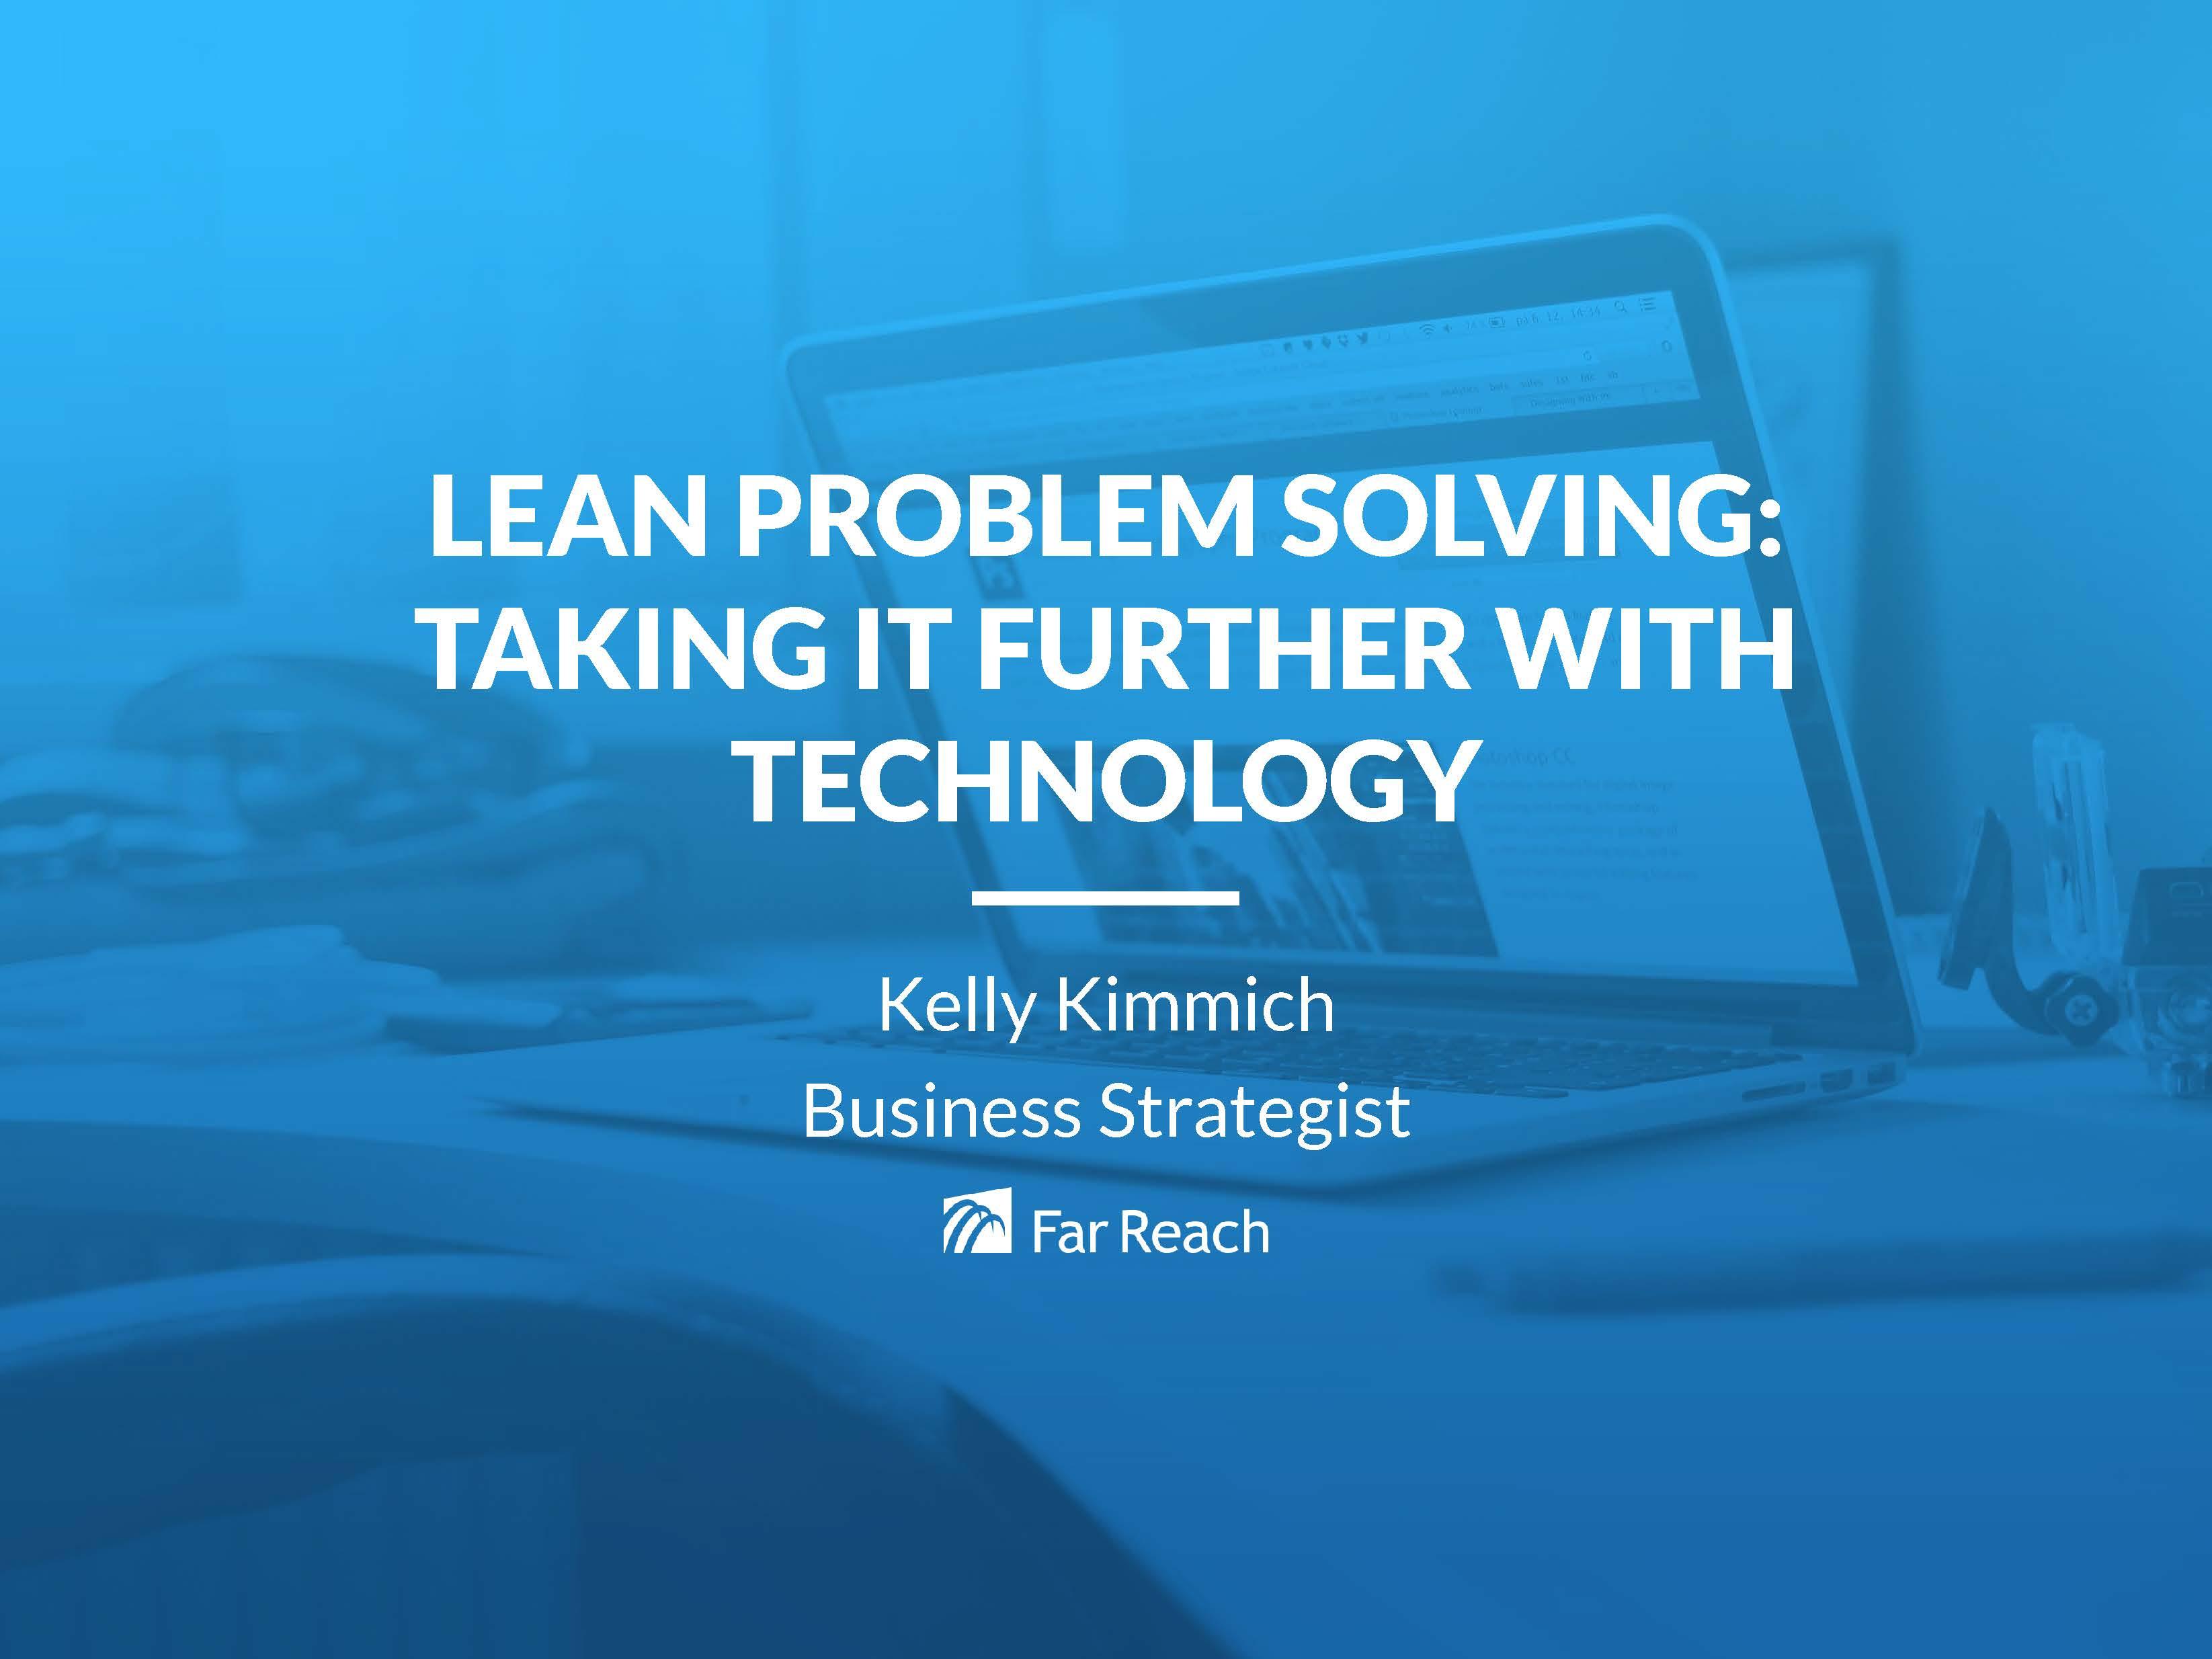 ILC Presentation - Problem Solving with Technology